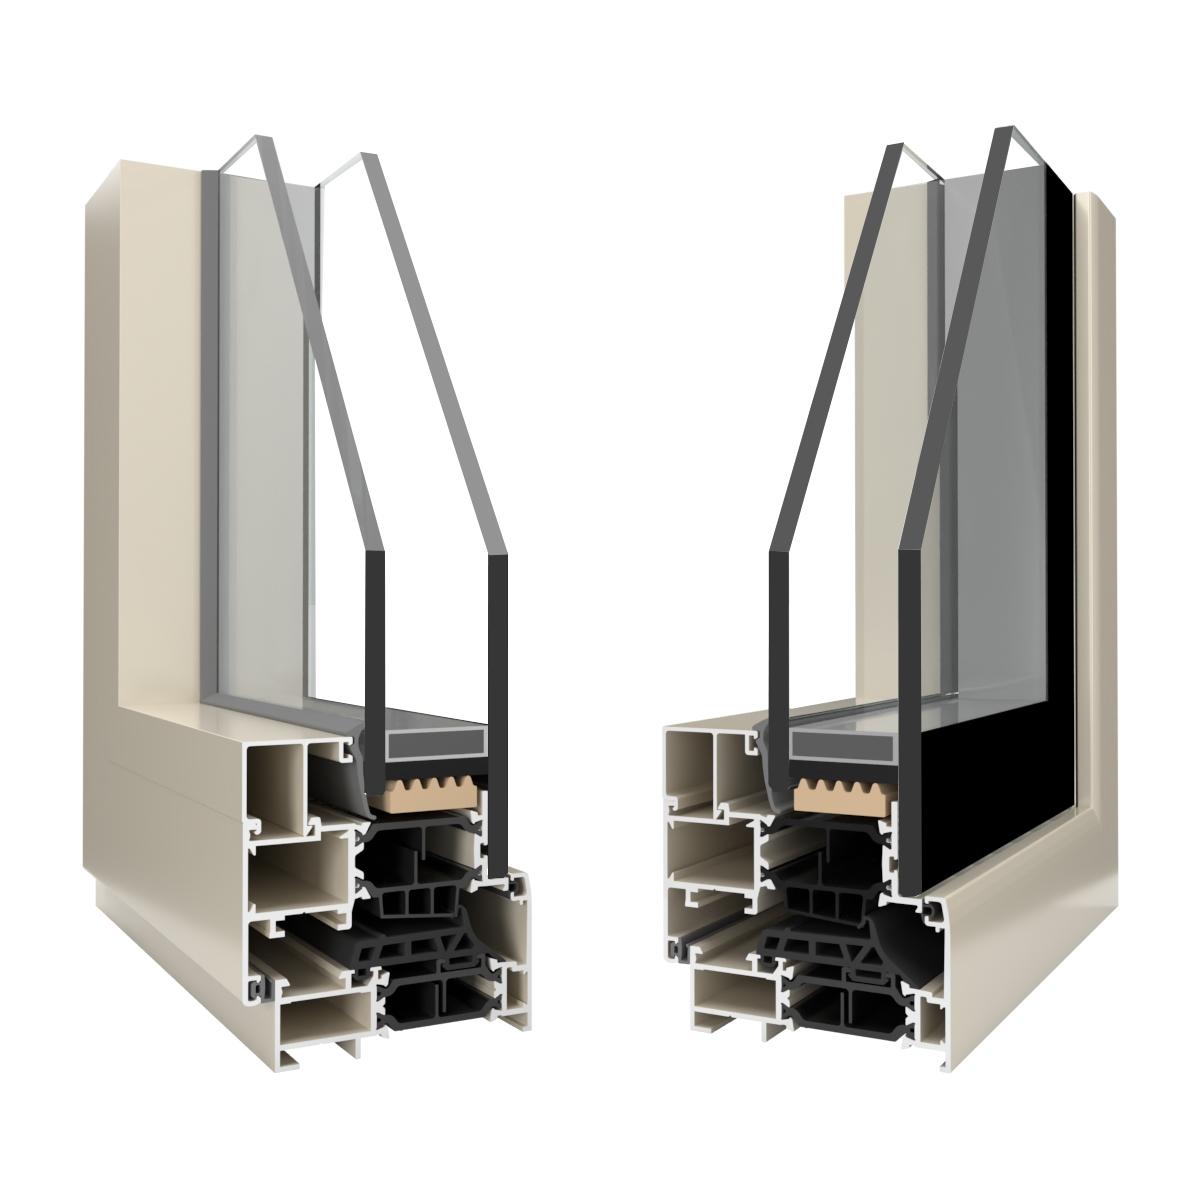 https://www.allpaint.it/wp-content/uploads/2021/07/thermika-totalglass-alluminio-allpaint.jpg